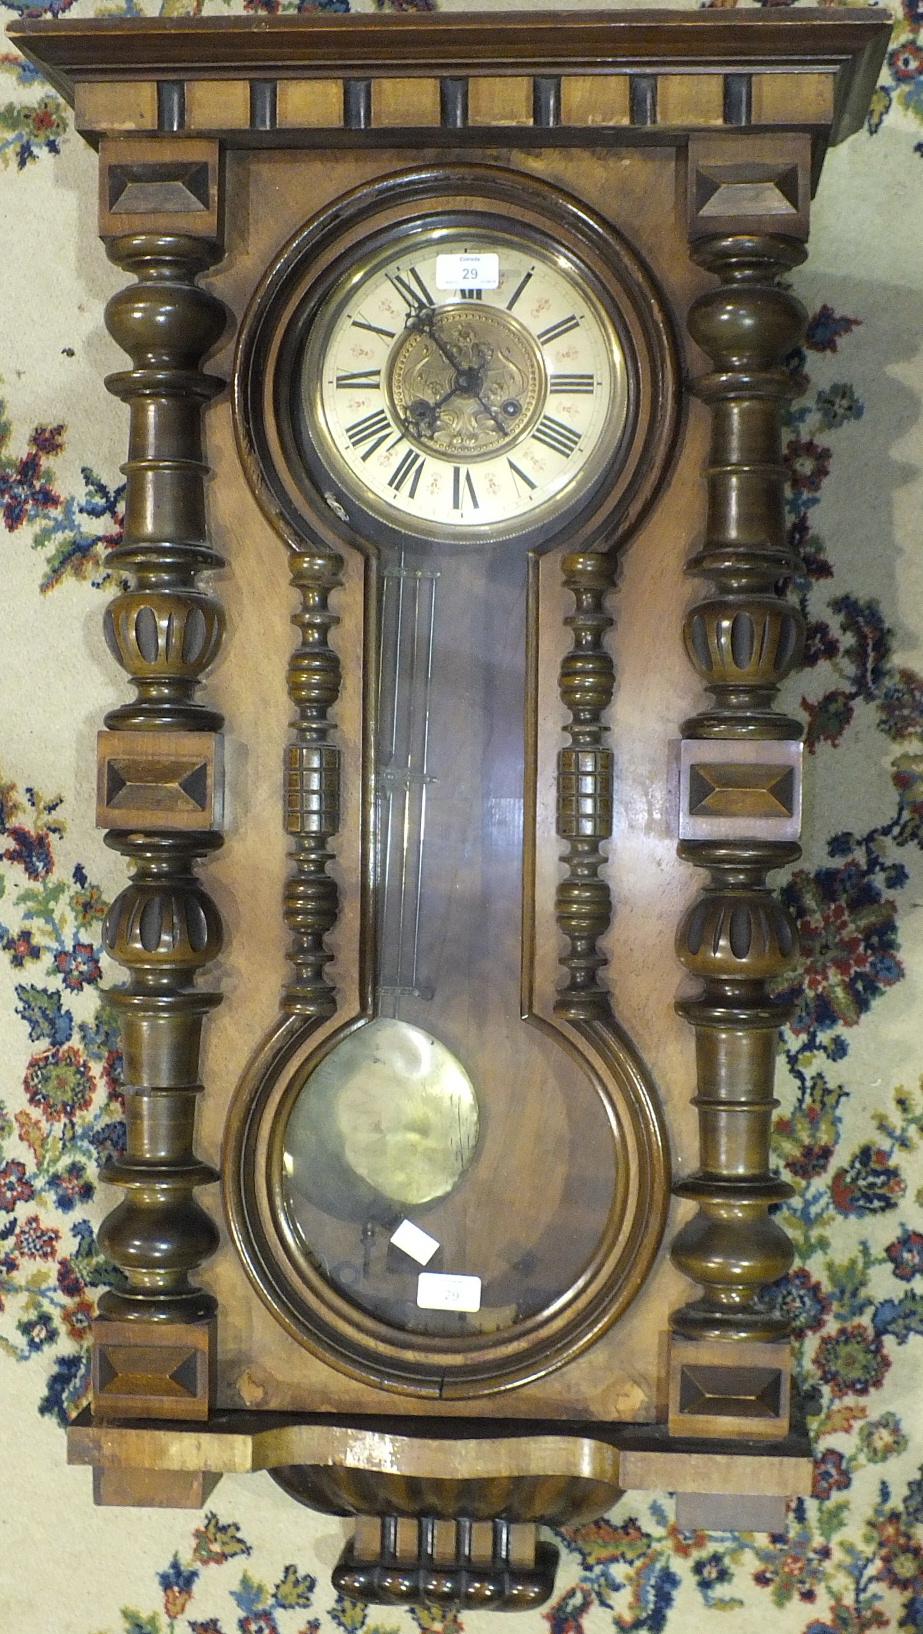 A Walnut cased Vienna style wall clock, 100cm high.